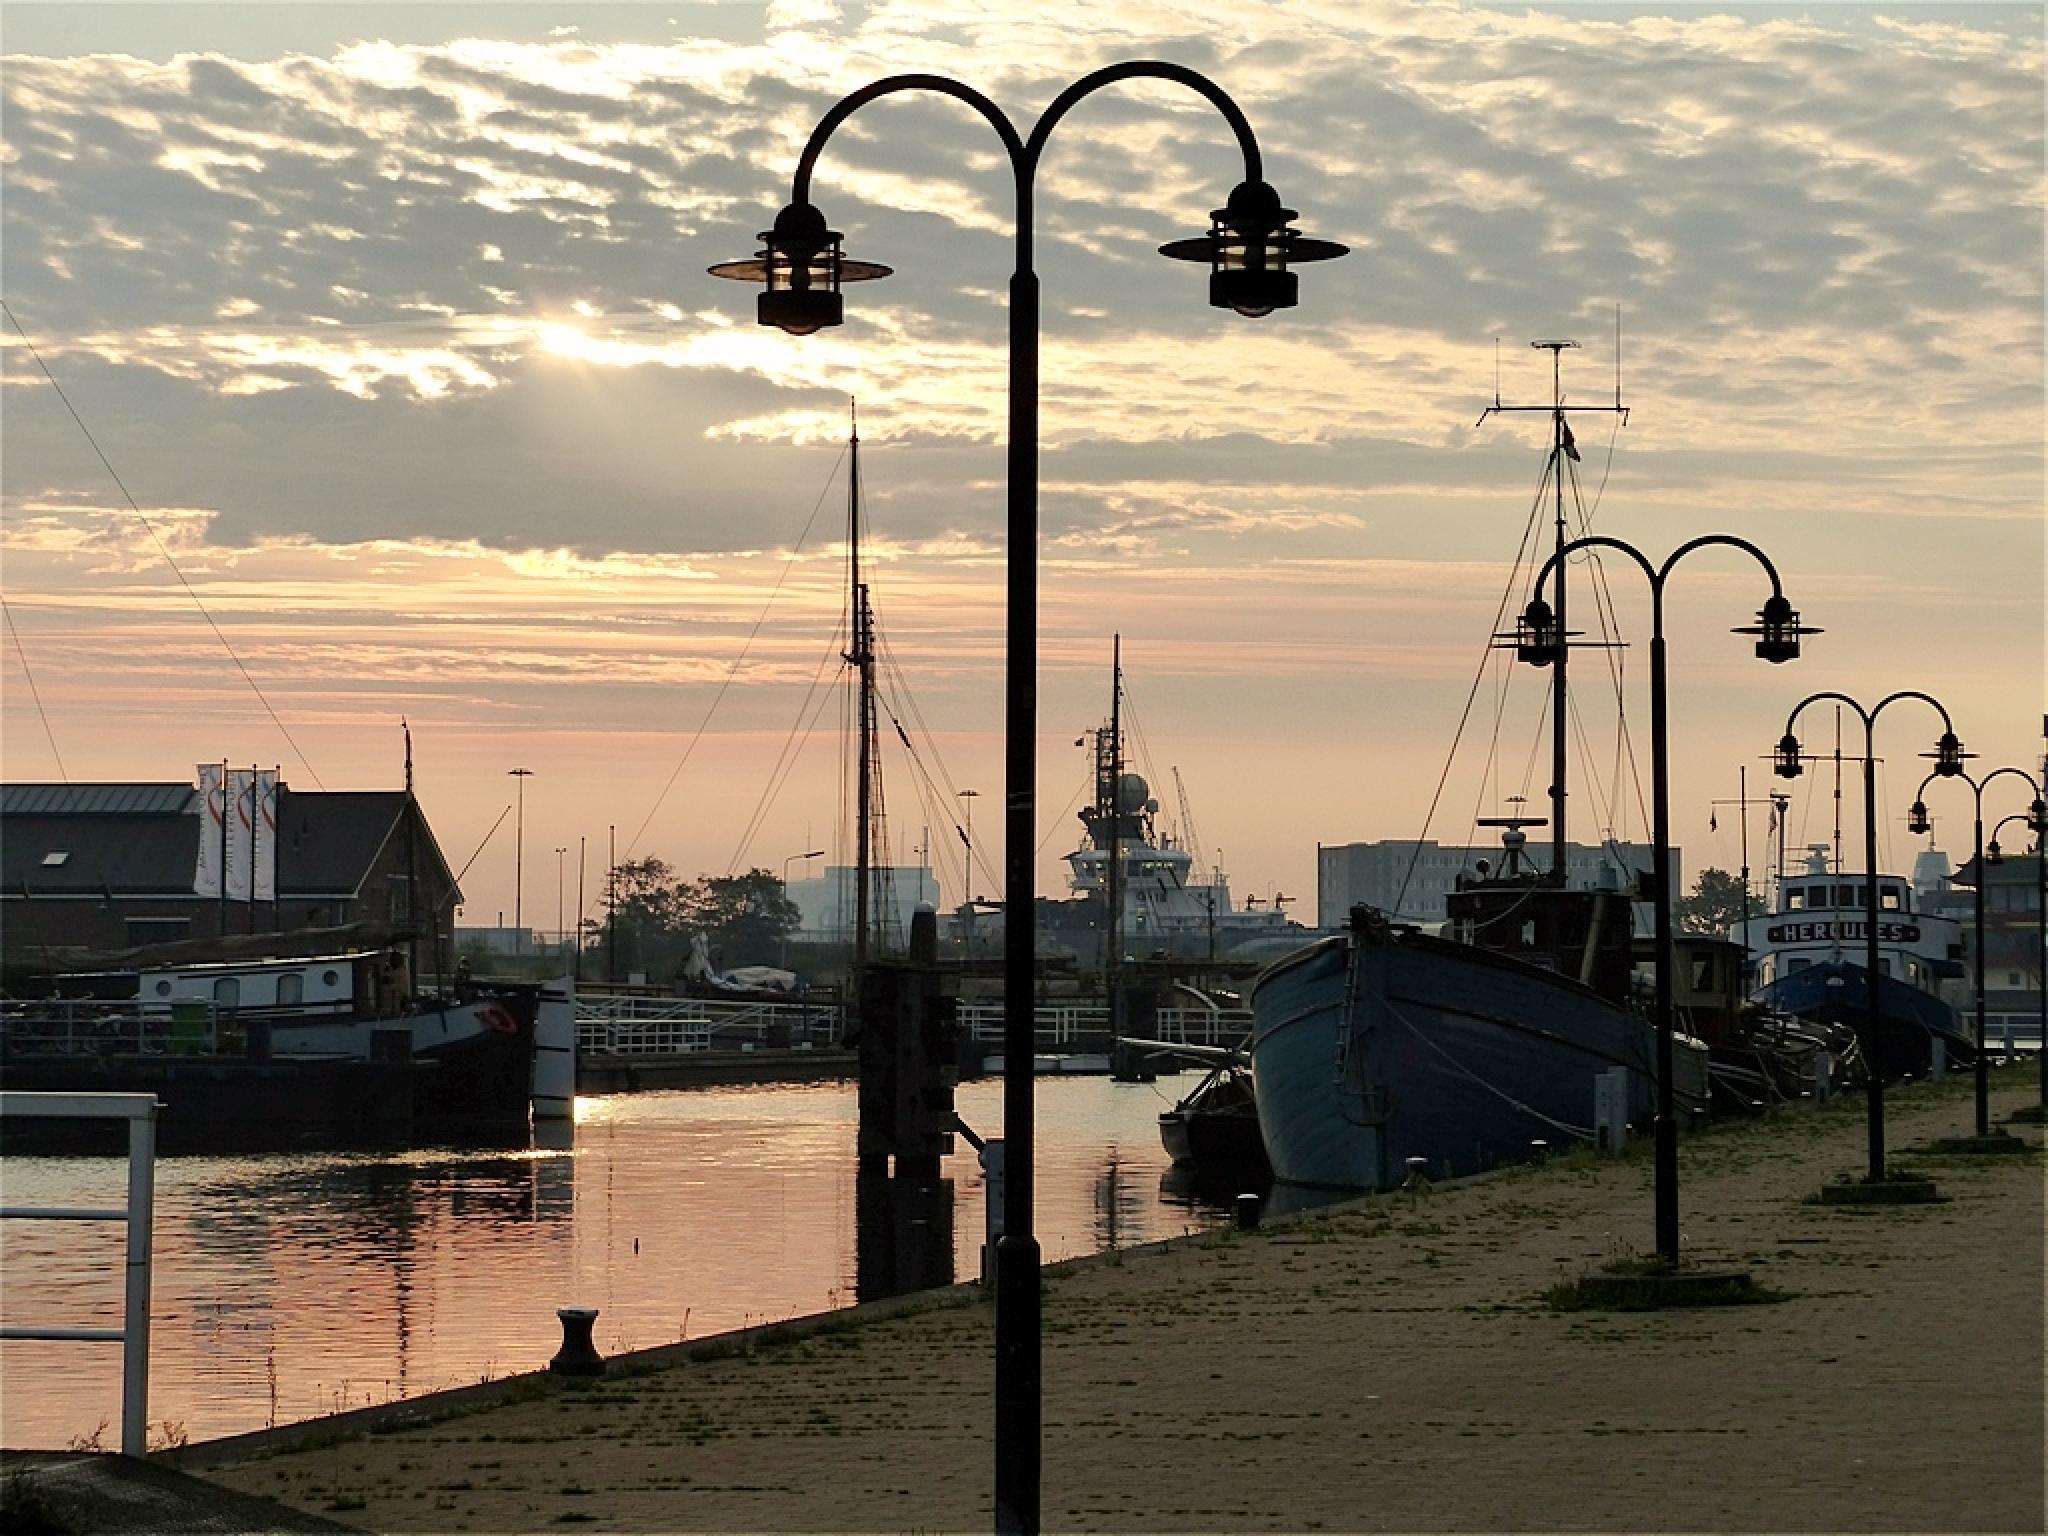 Early in the morning at Willemsoord, Den Helder (Netherlands) by patrick vischschraper